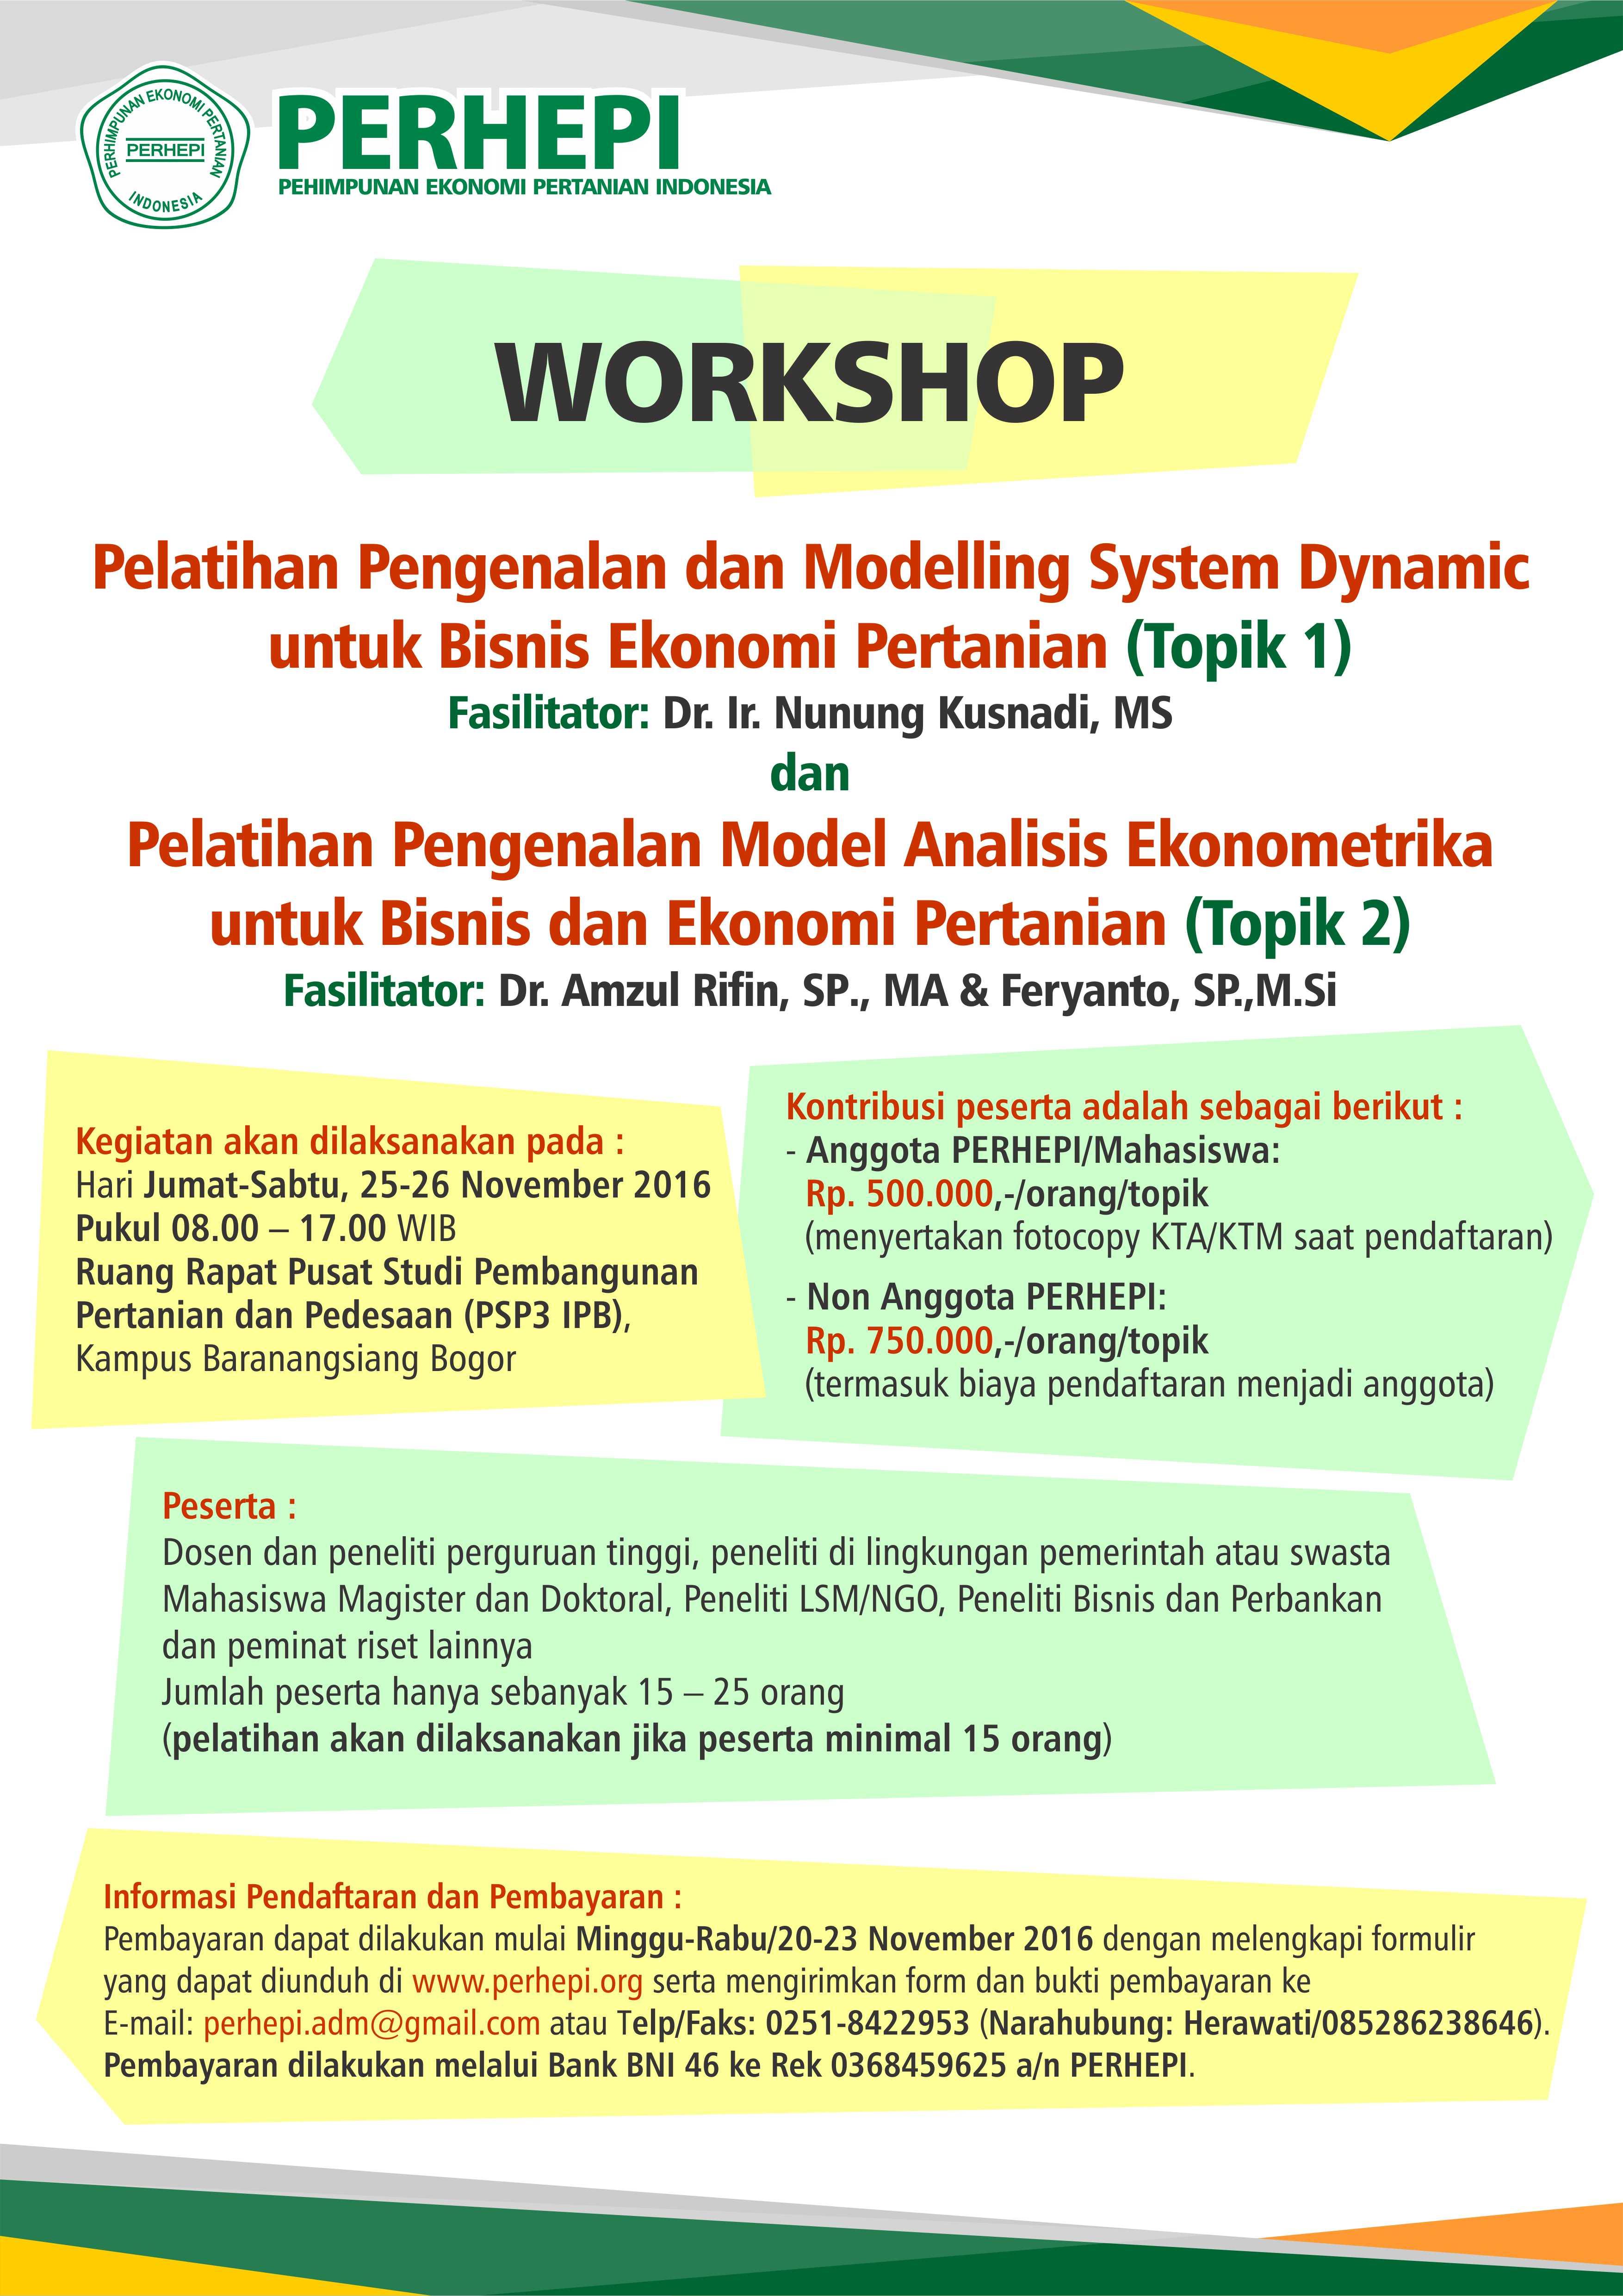 Ekonometrika Archives Perhimpunan Ekonomi Pertanian Indonesia